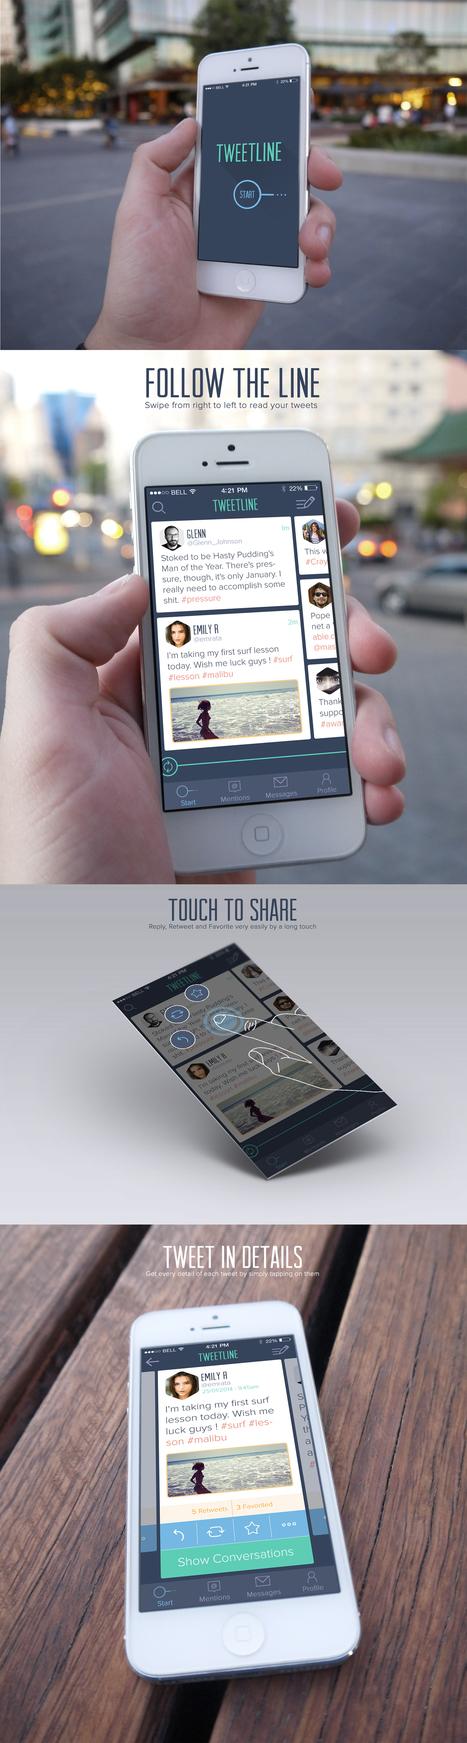 Concept App Twitter | Benchmark Mobile User Interface | Scoop.it